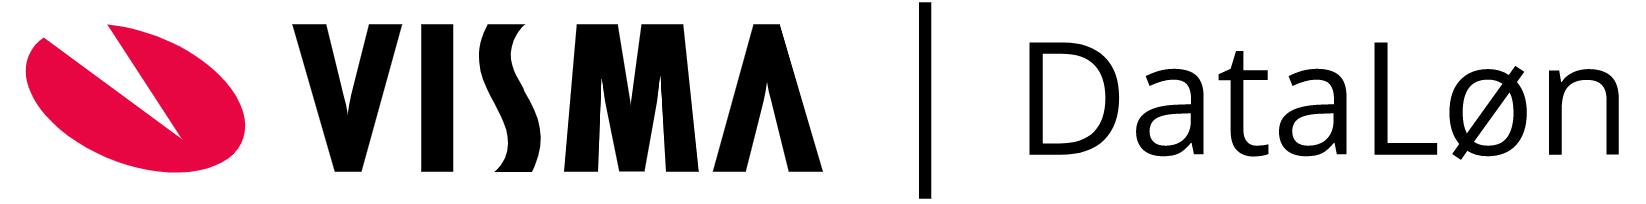 visma-dataloen-logo-UK